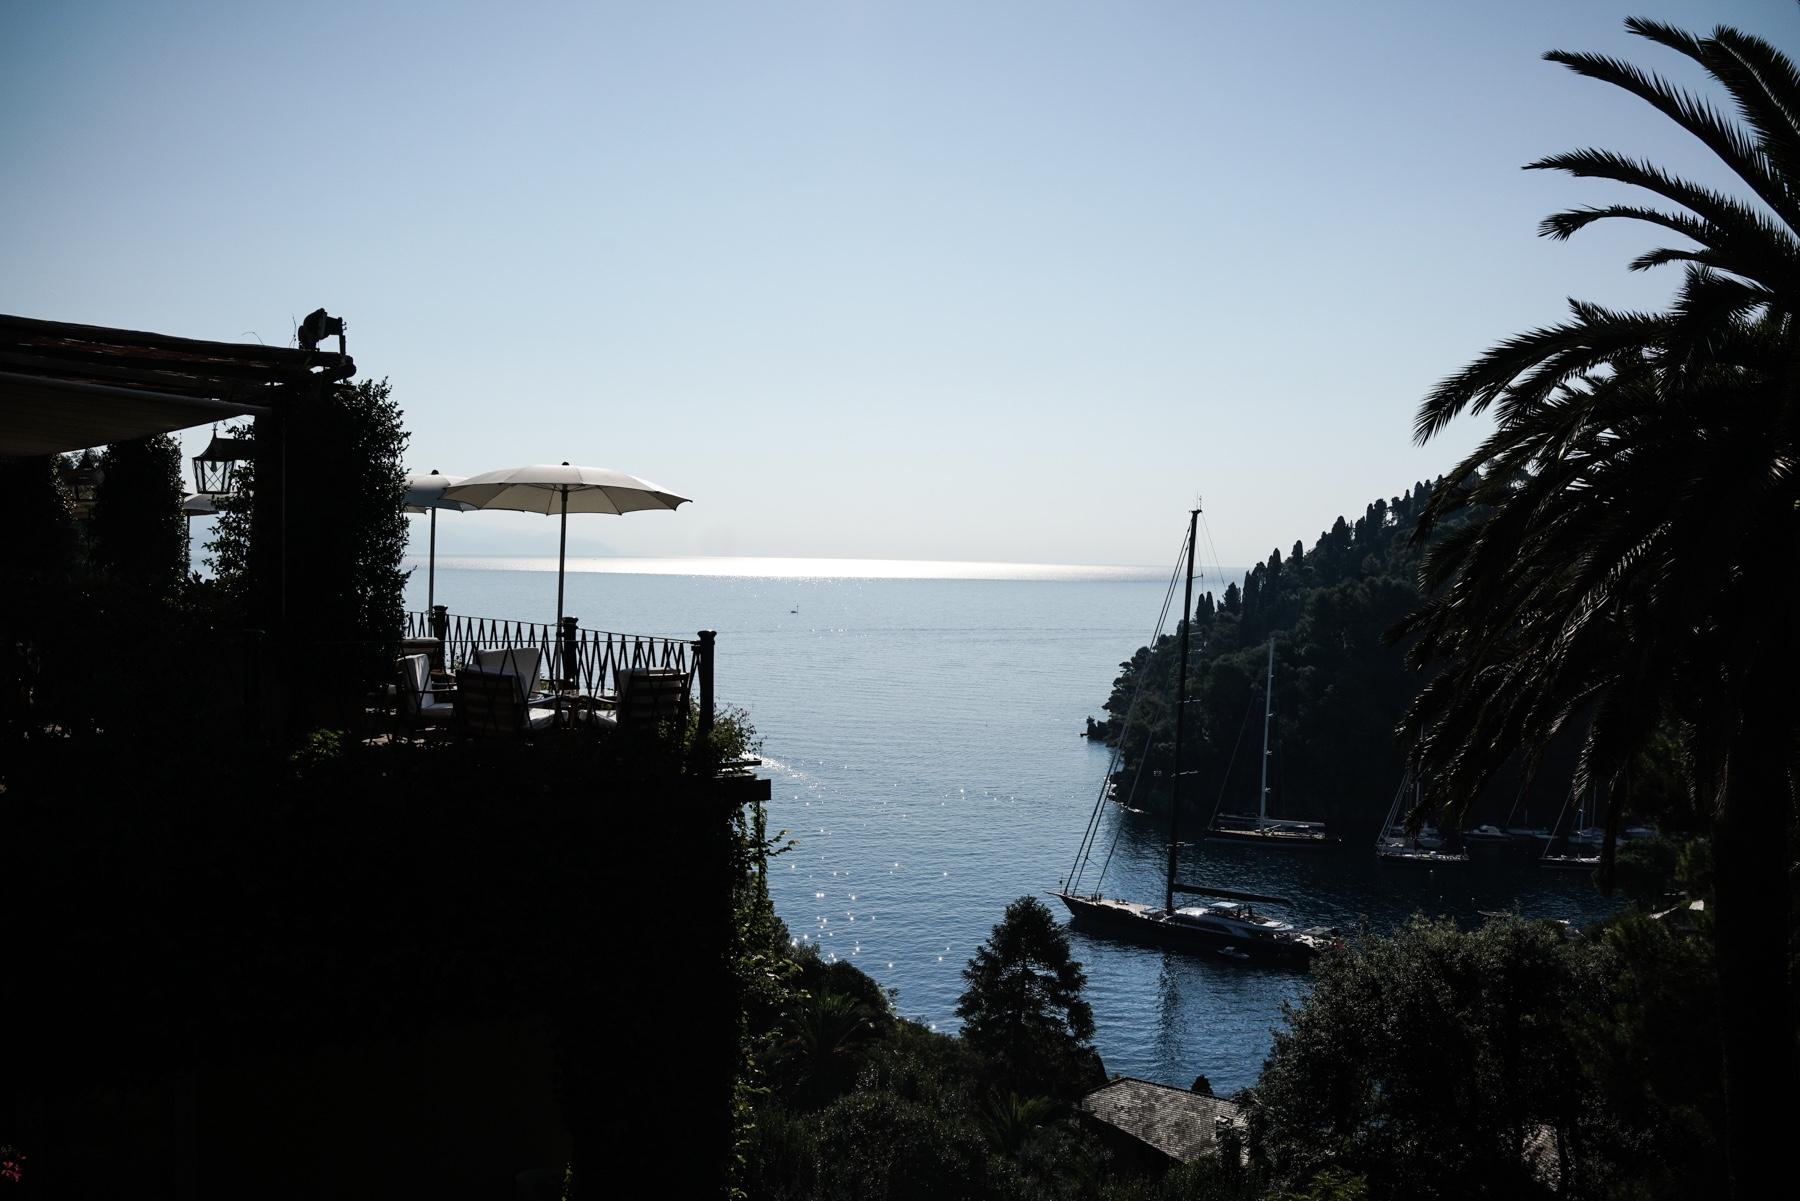 style-shiver-travel-ligurien-italien-27